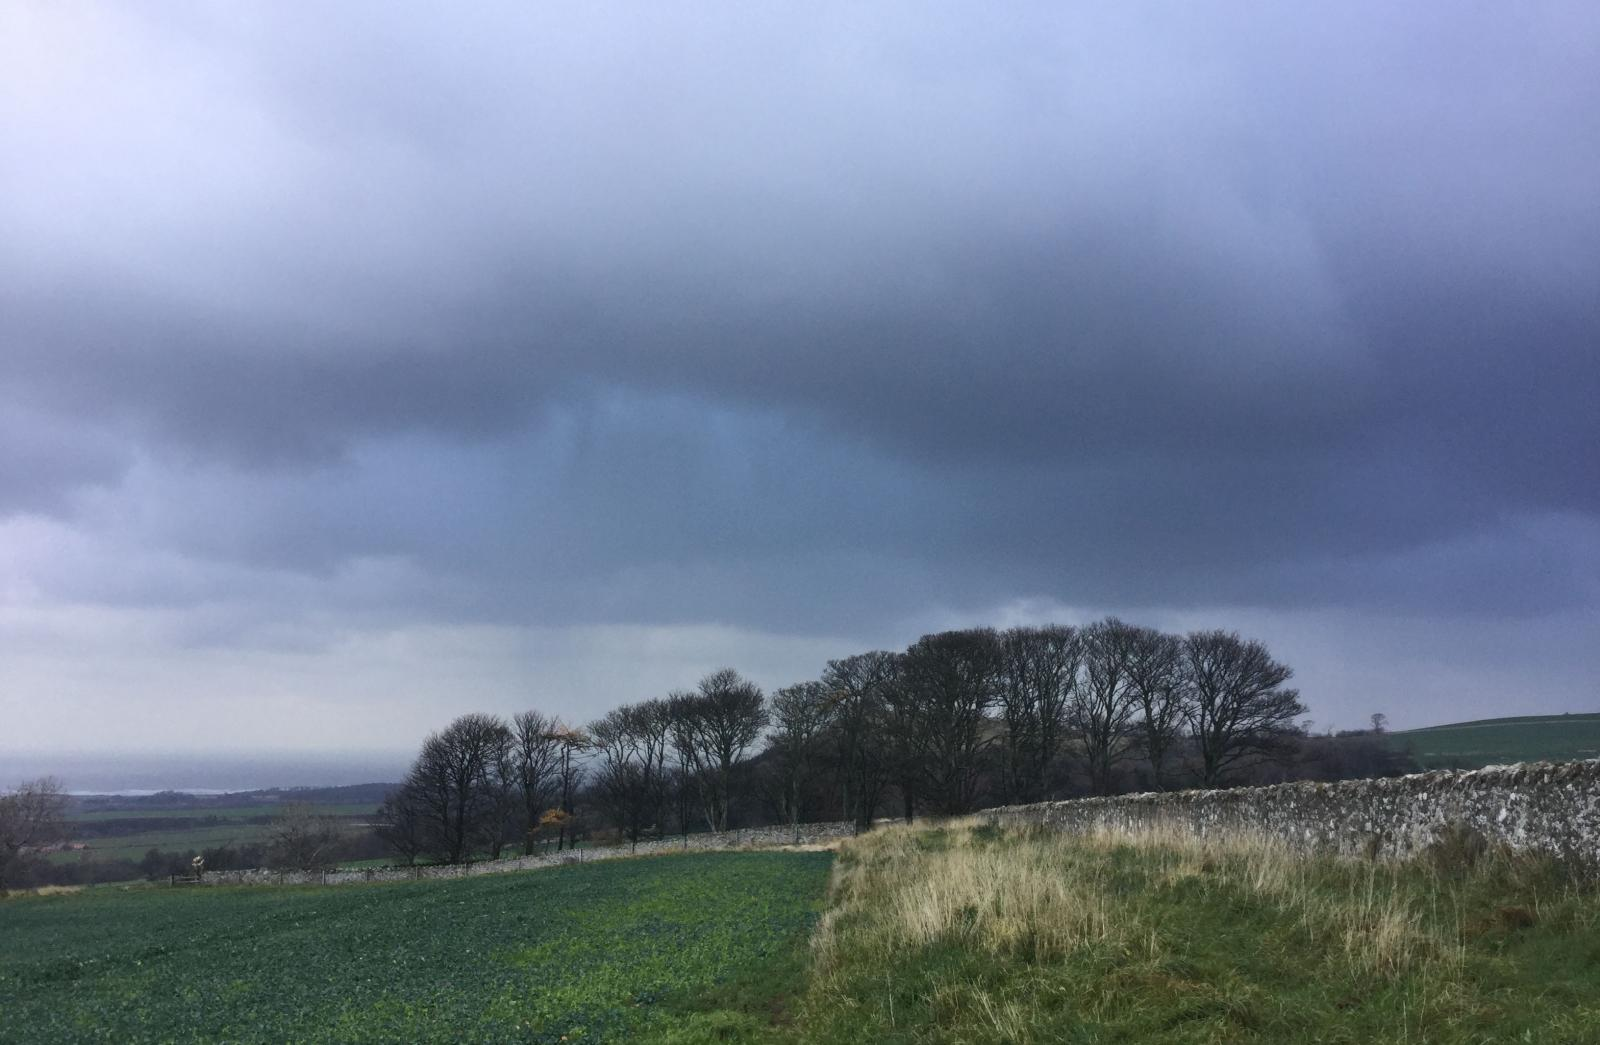 NImbostratus rain bearing clouds